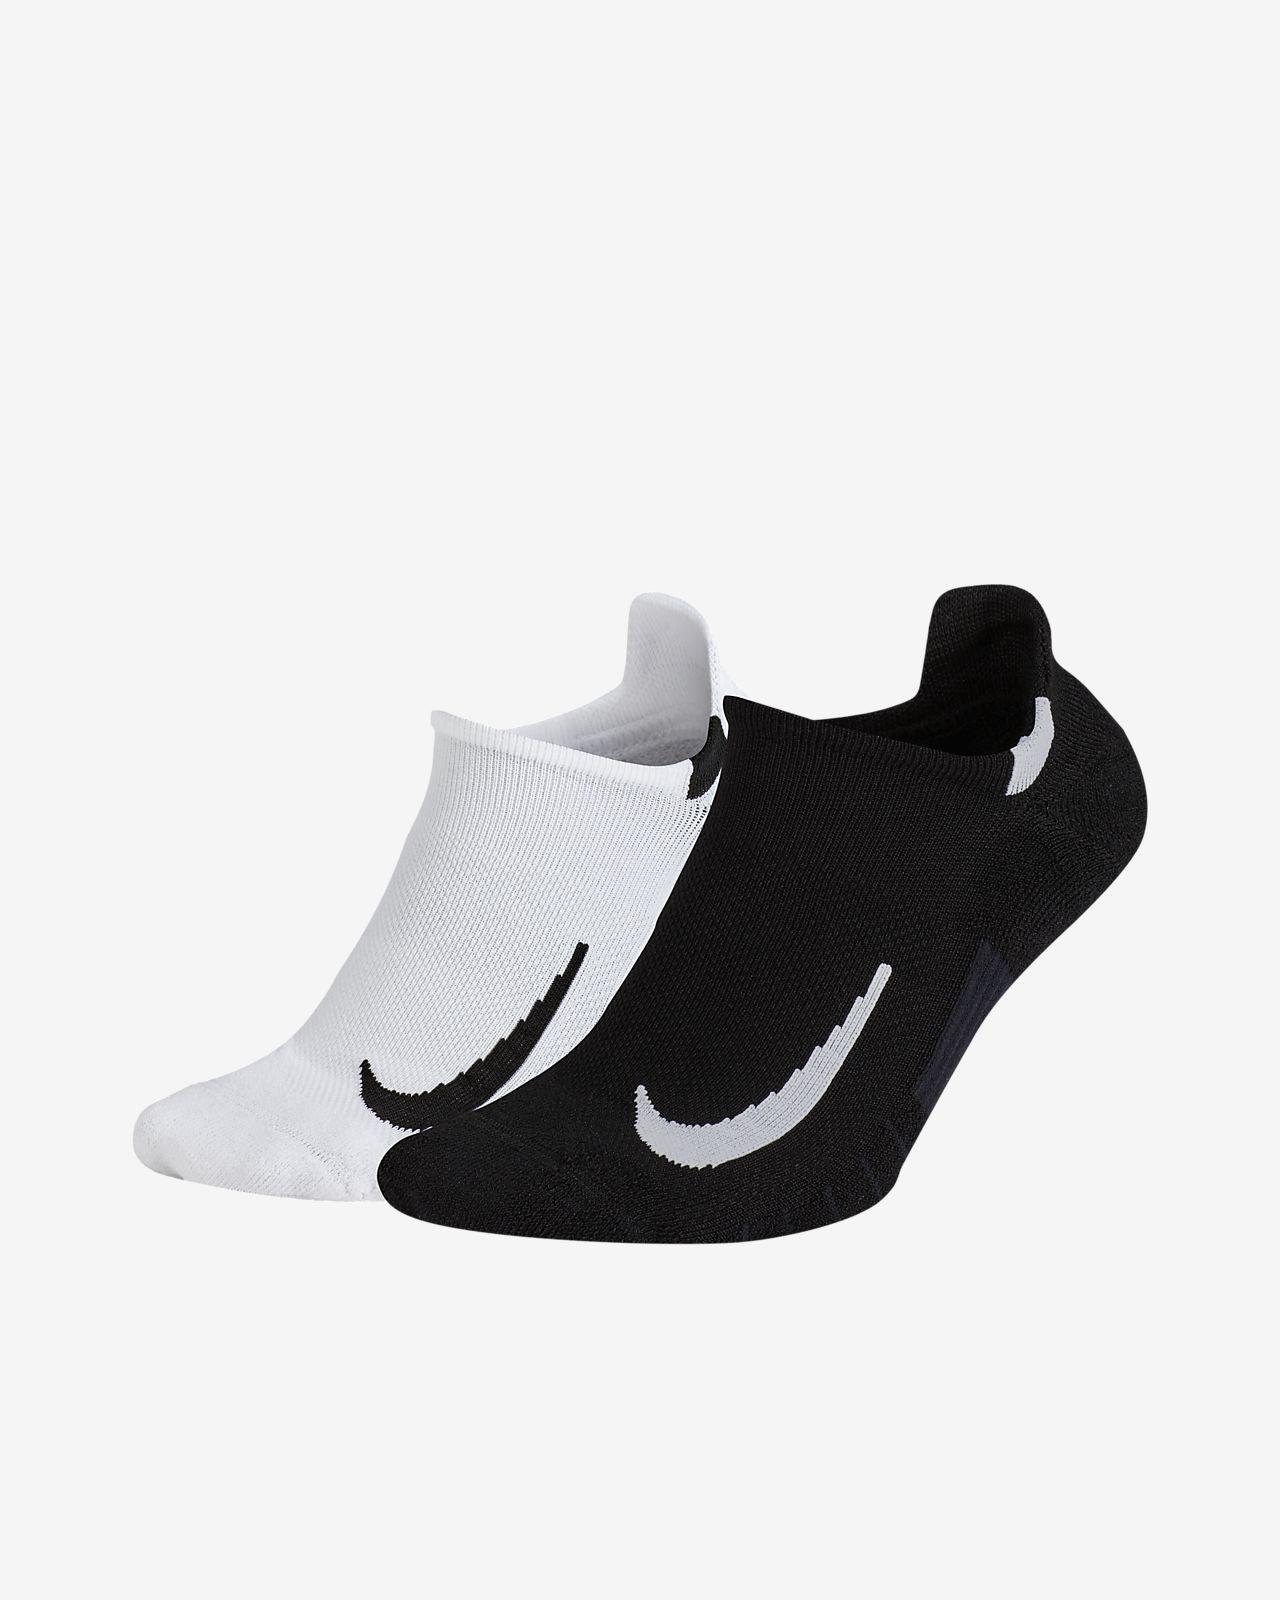 Nike Multiplier 隱形襪 (2 雙)